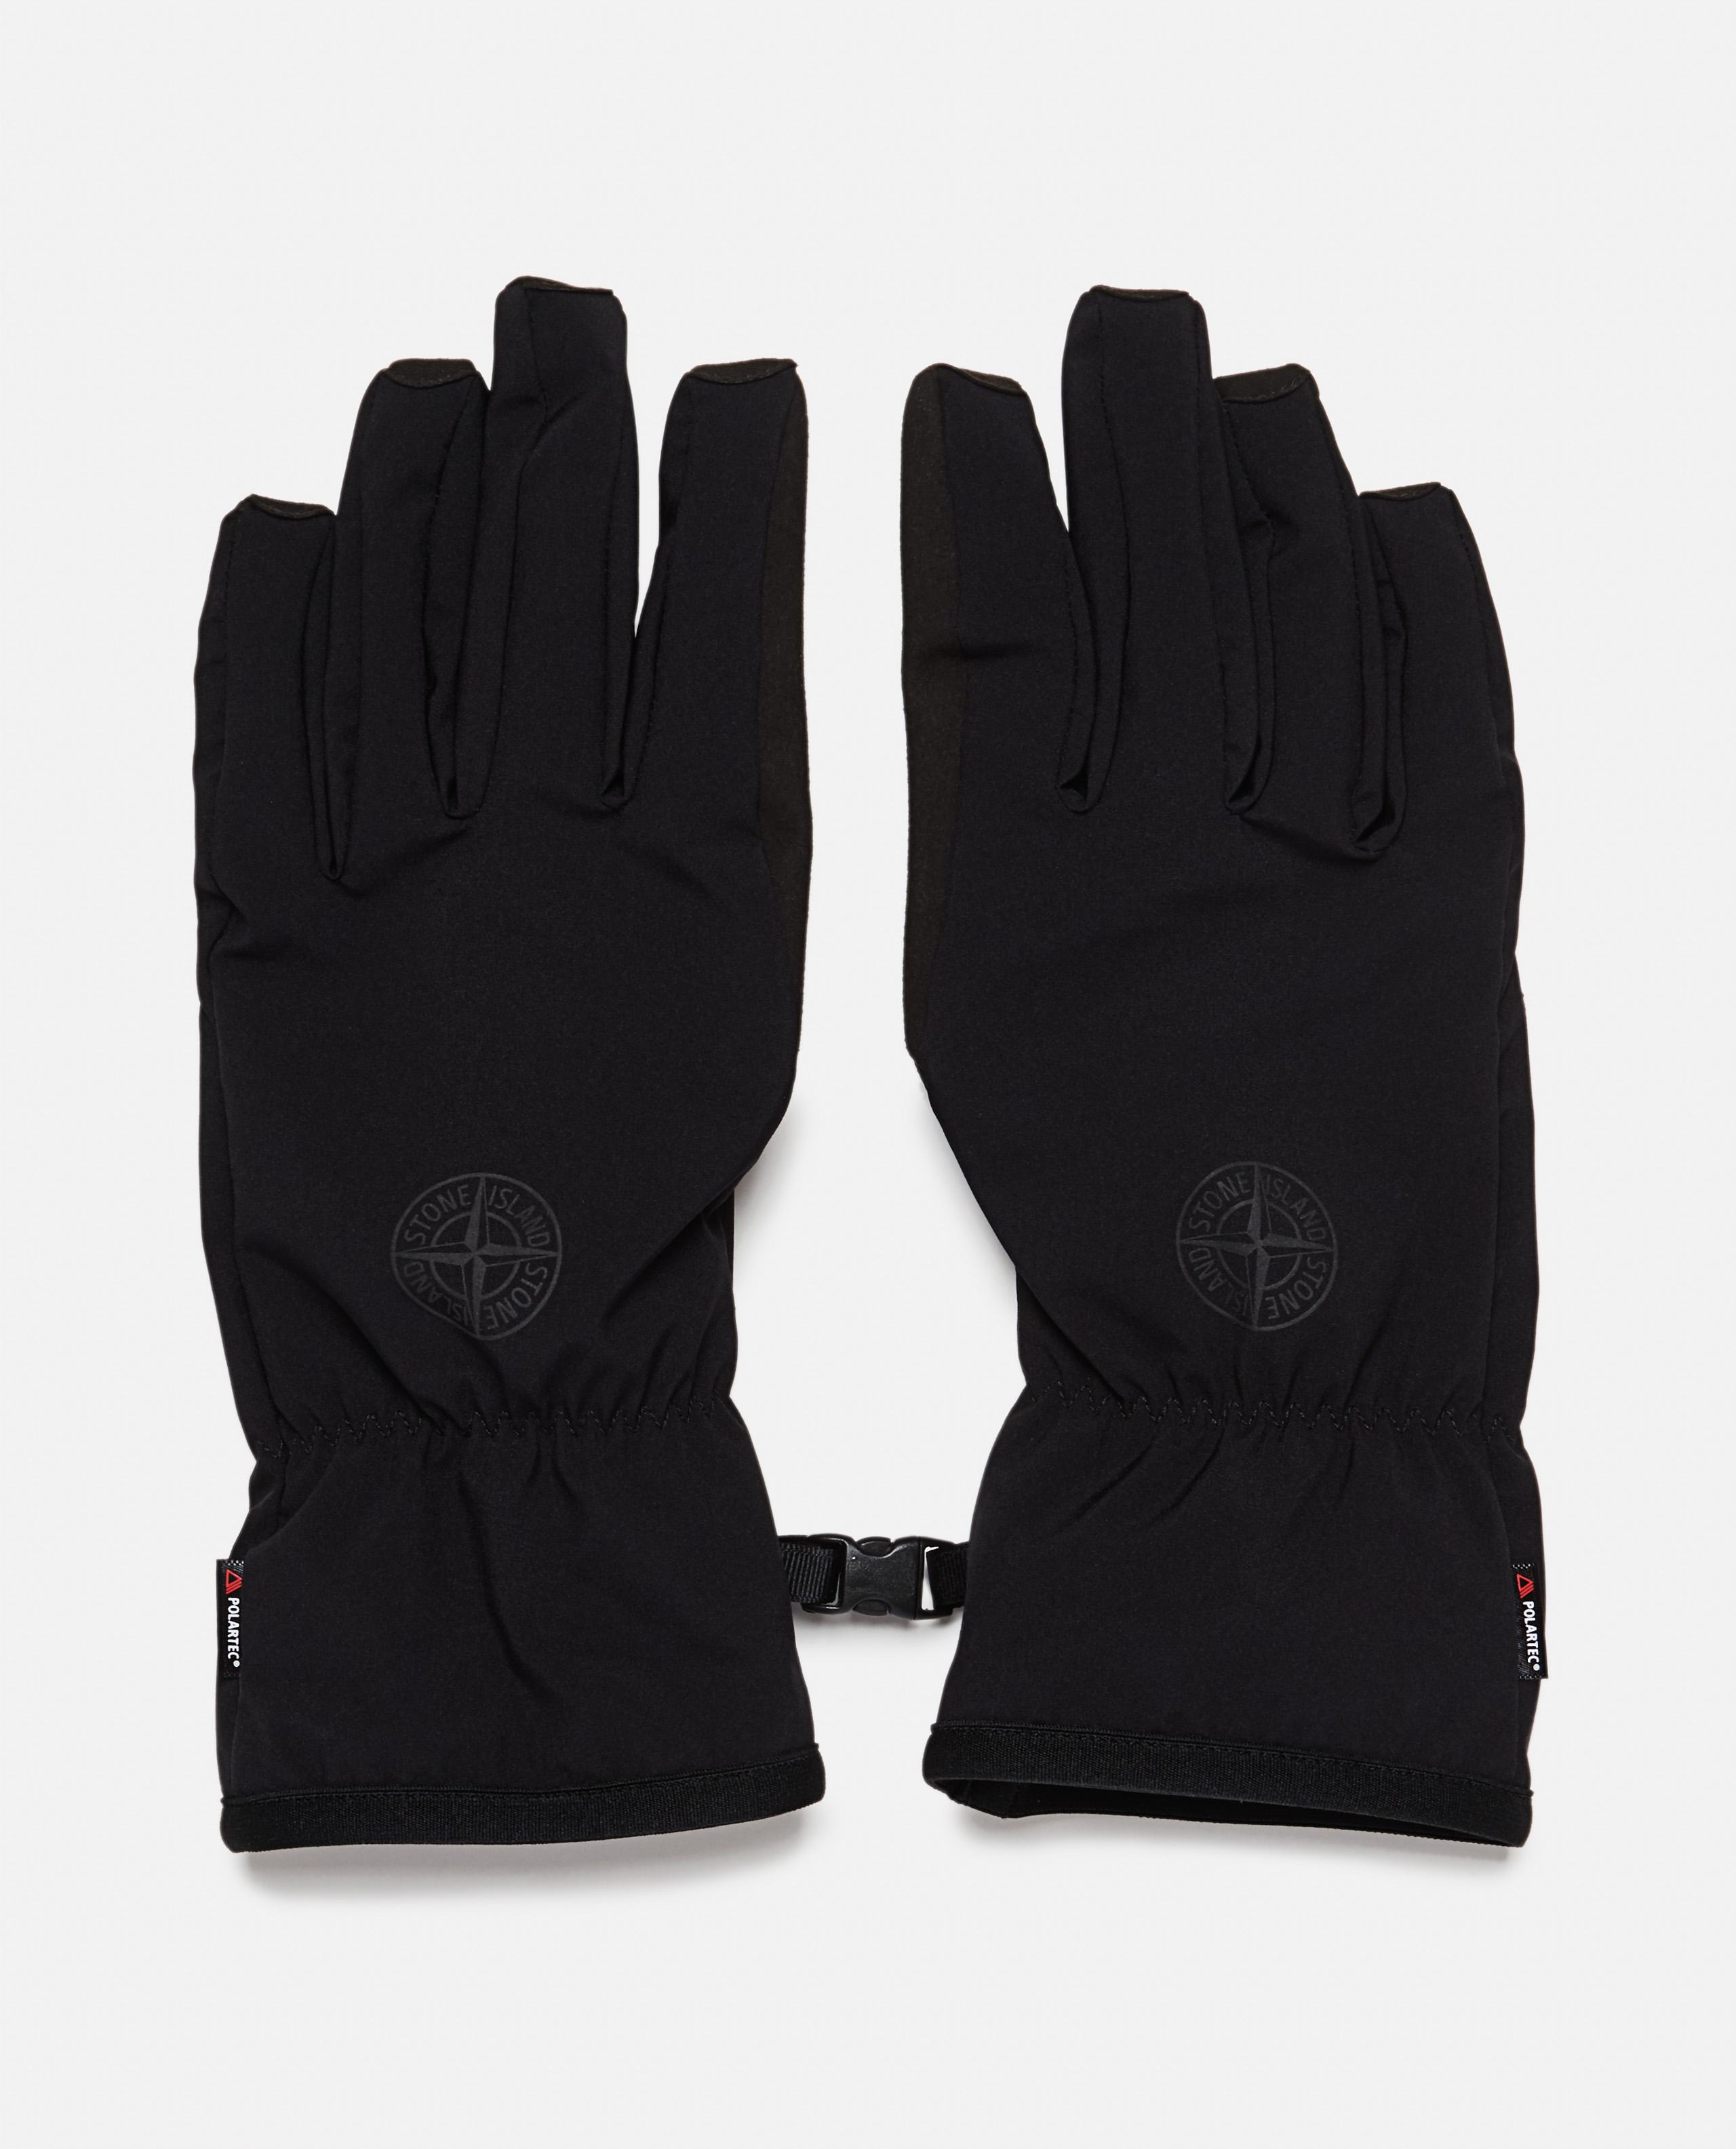 Soft Shell-R gloves